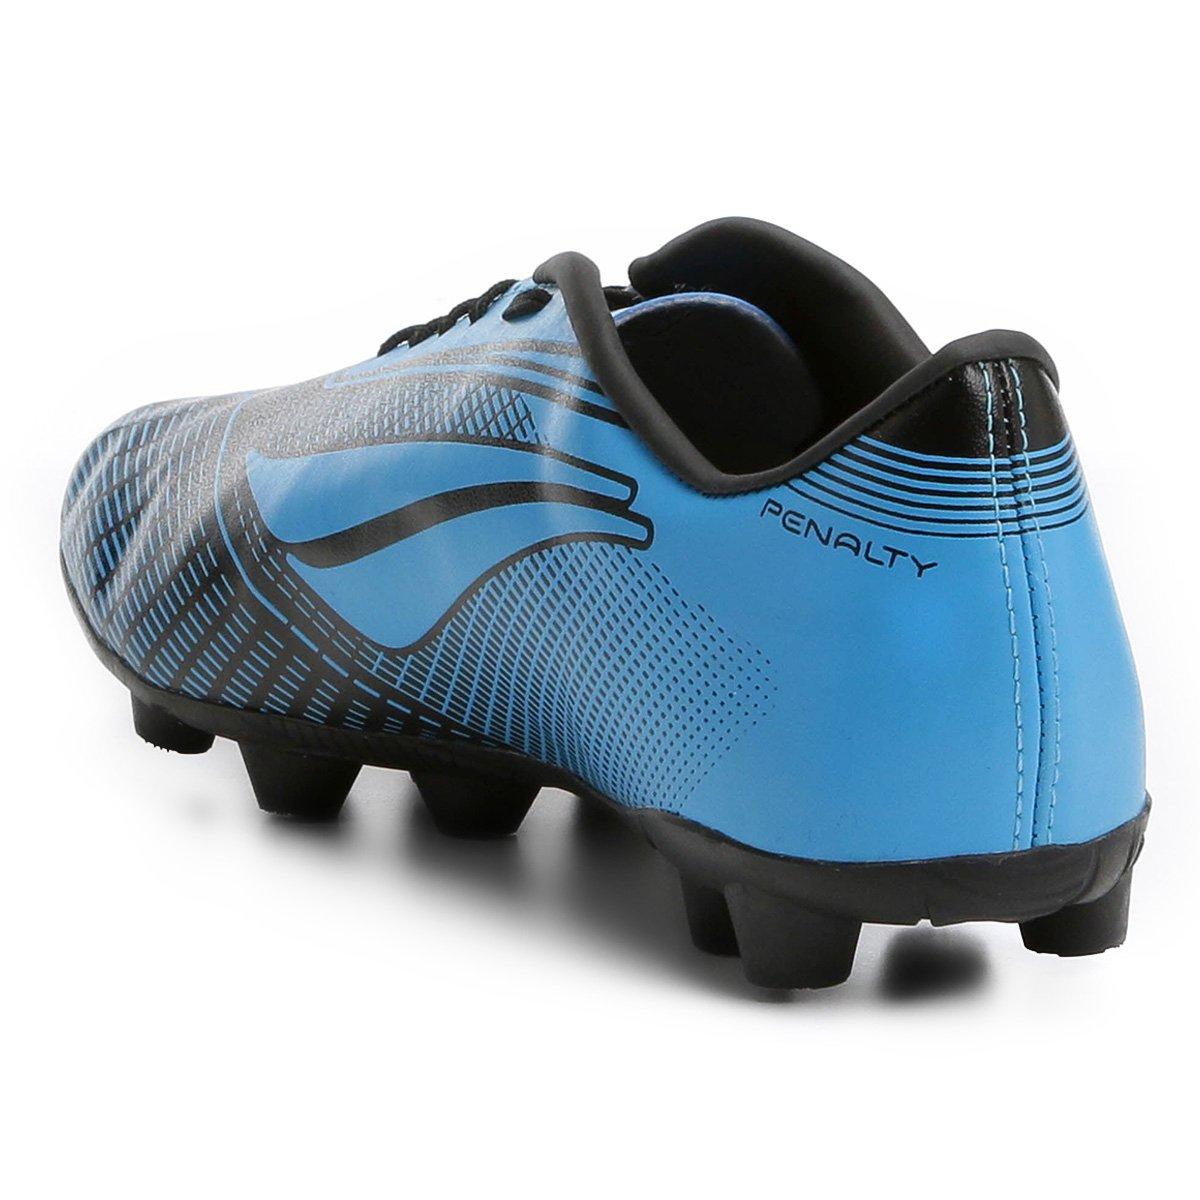 Chuteira Campo Penalty Storm Speed 7 - Preto e Azul - Compre Agora ... 6d523e4dc9521